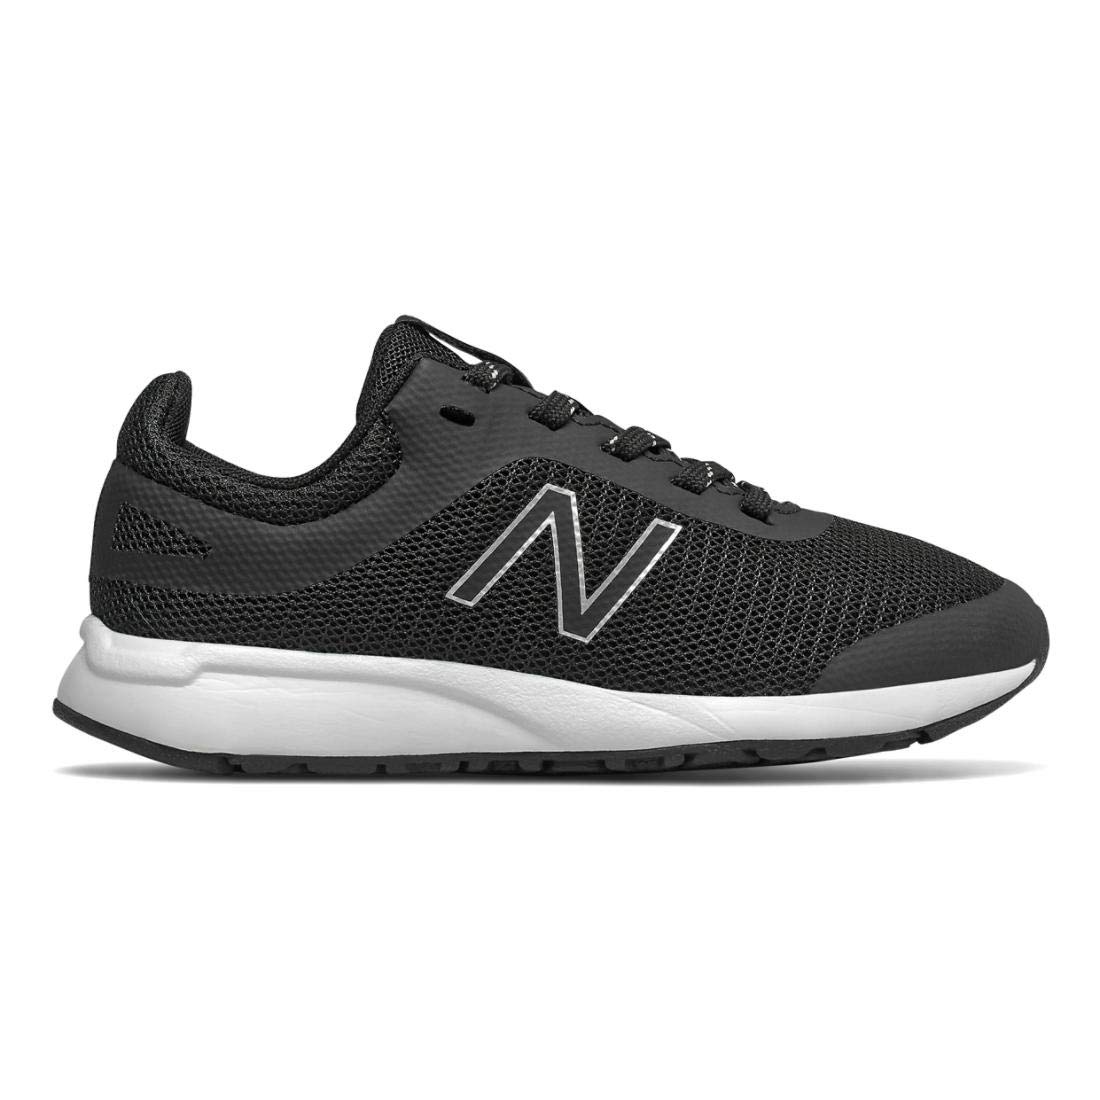 New Balance Boys' 455v2 Running Shoe, Black/White, 4.5 M US Big Kid